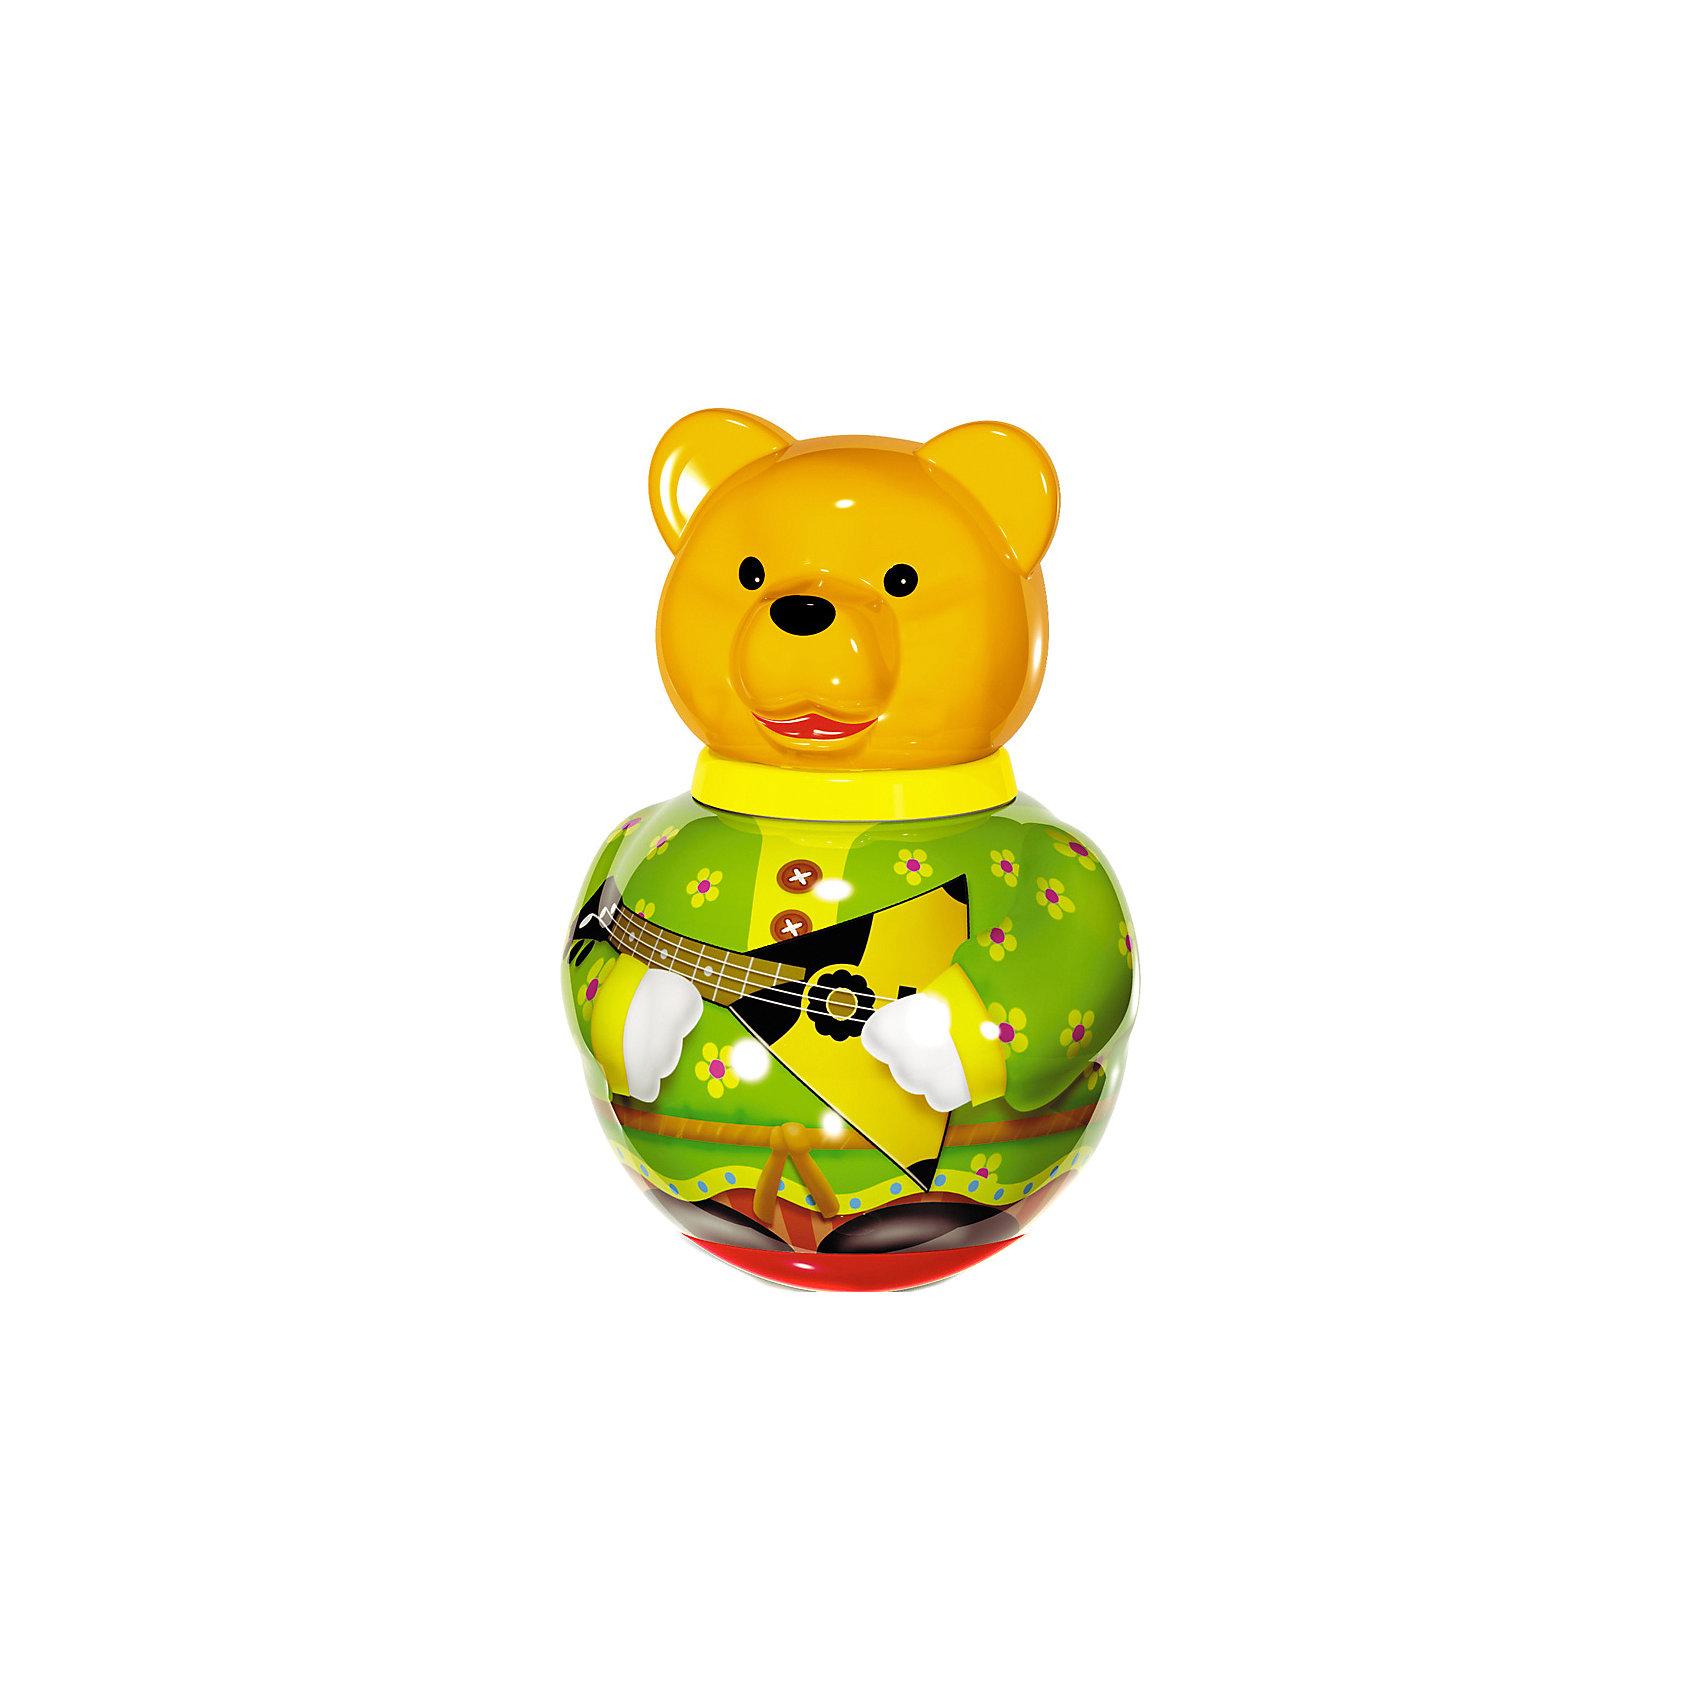 Стеллар Неваляшка Бурый медведь Потапыч, в ассортименте, Стеллар стеллар музыкальные игрушки набор 1 stellar